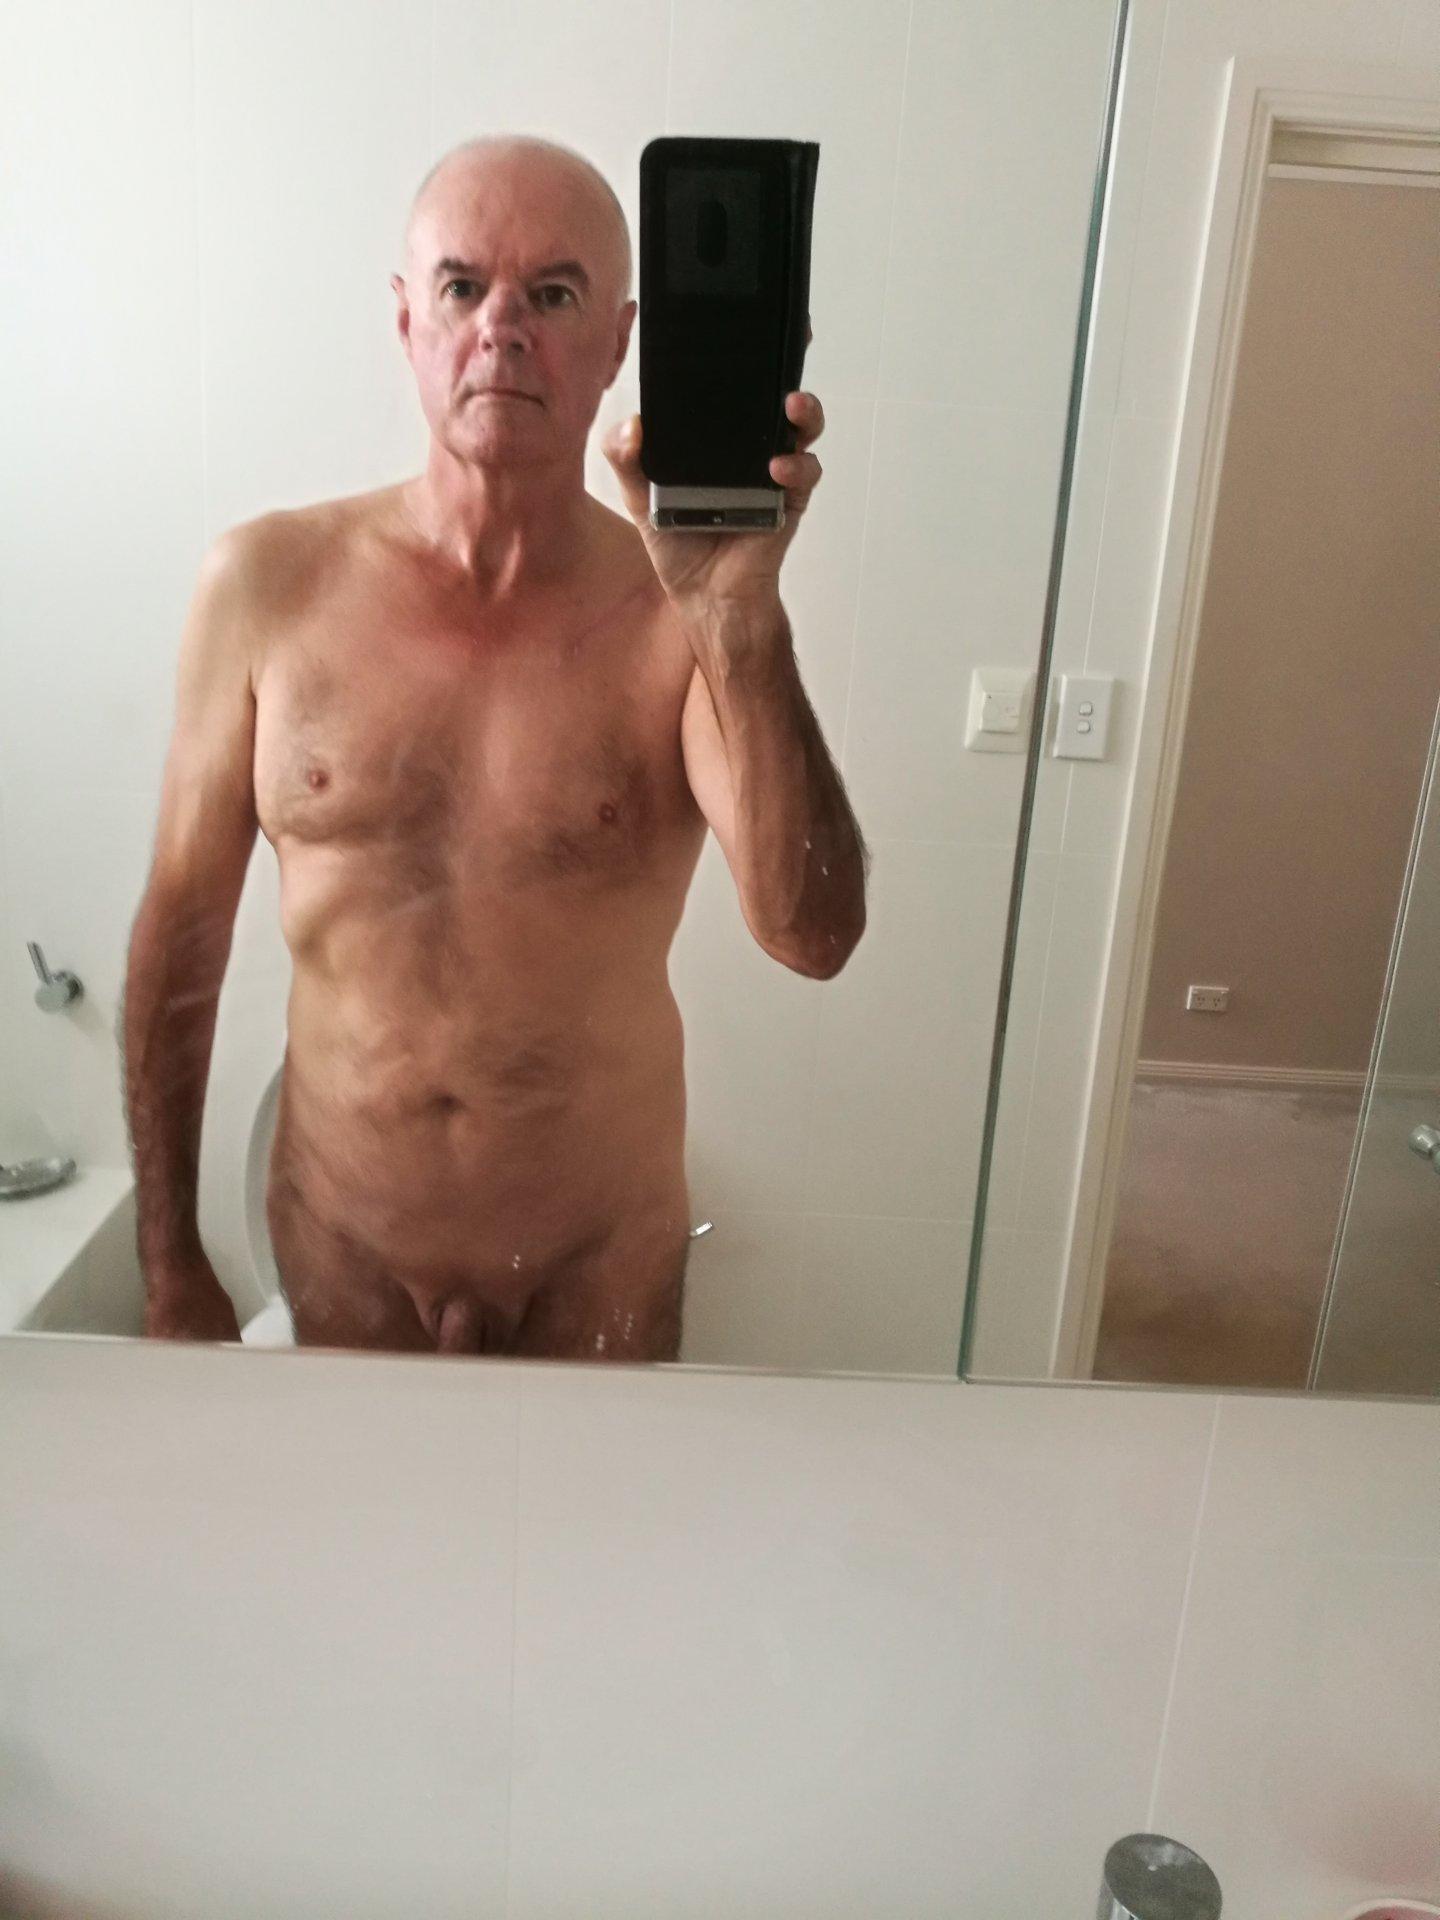 Bernardo from New South Wales,Australia